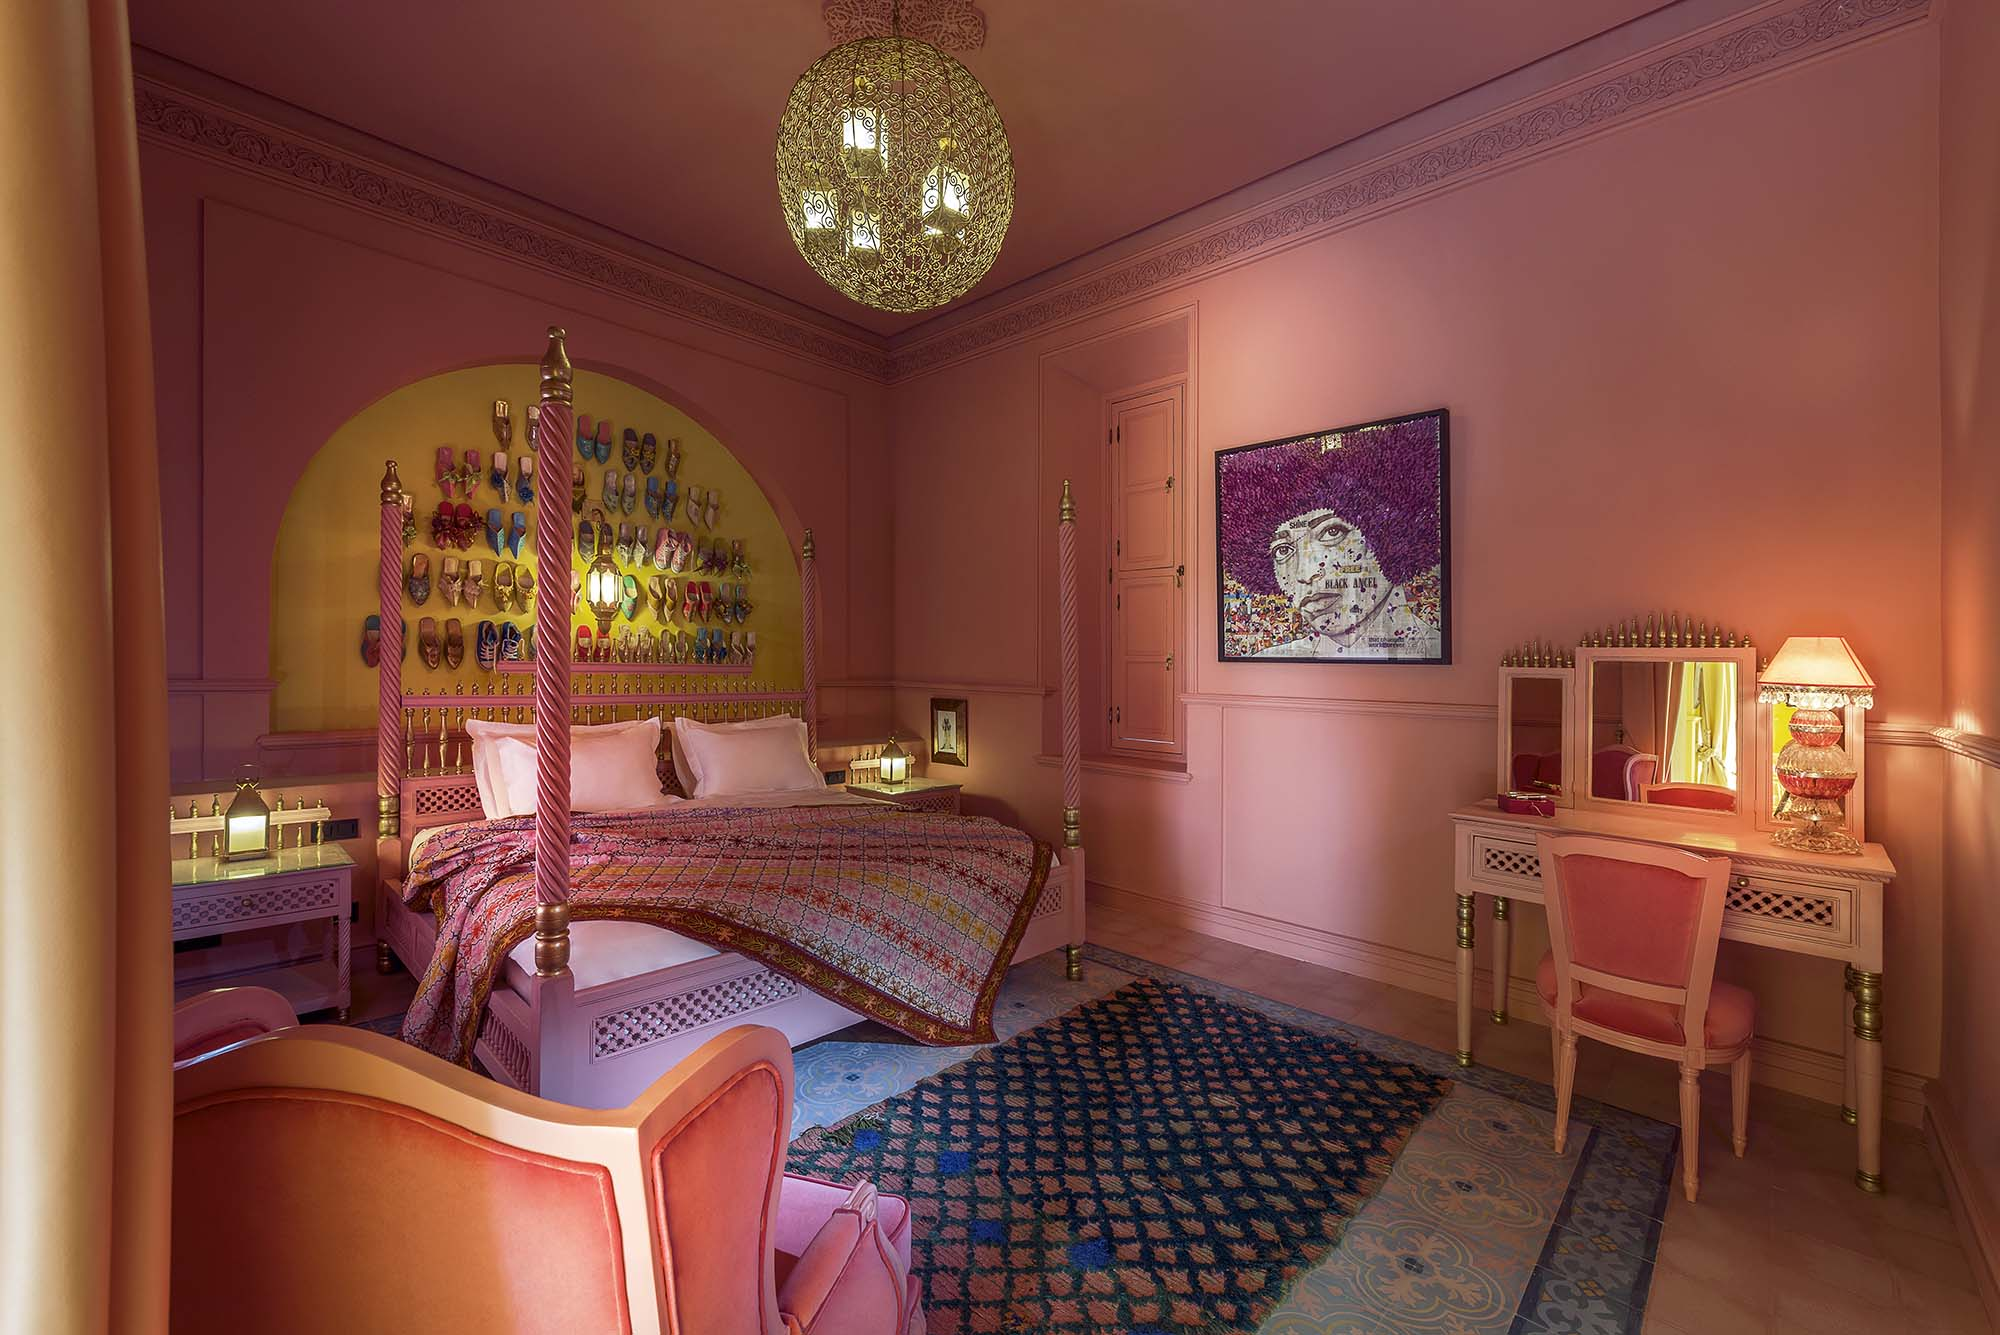 https://www.thesourcemarrakech.com/wp-content/uploads/2017/08/suite-Yellow-Sub-maison-hotes-The-Souce-Marrakech.jpg